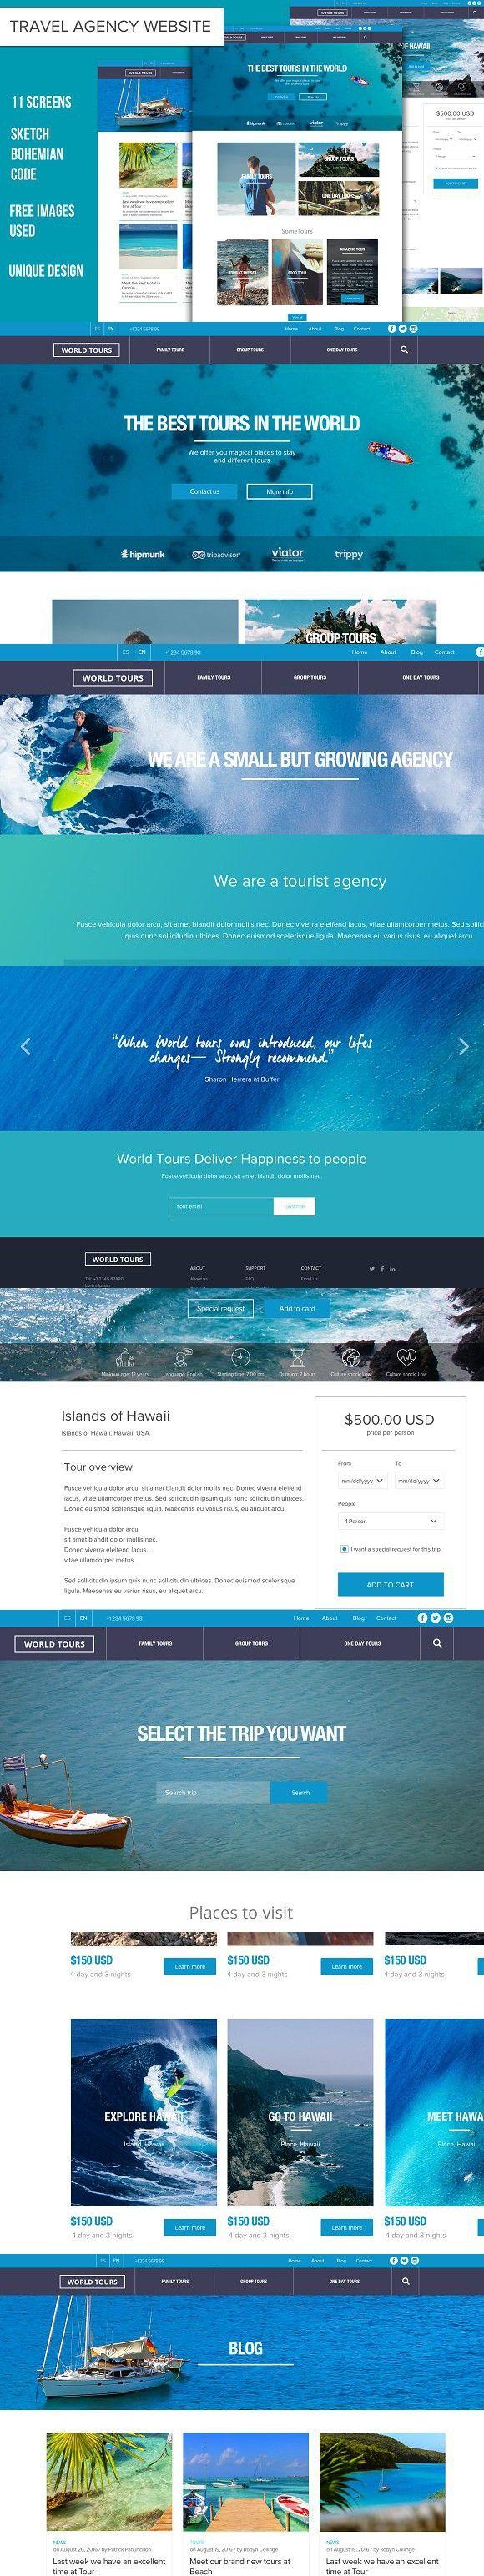 TravelAgency Sketch Website Template. Website Templates